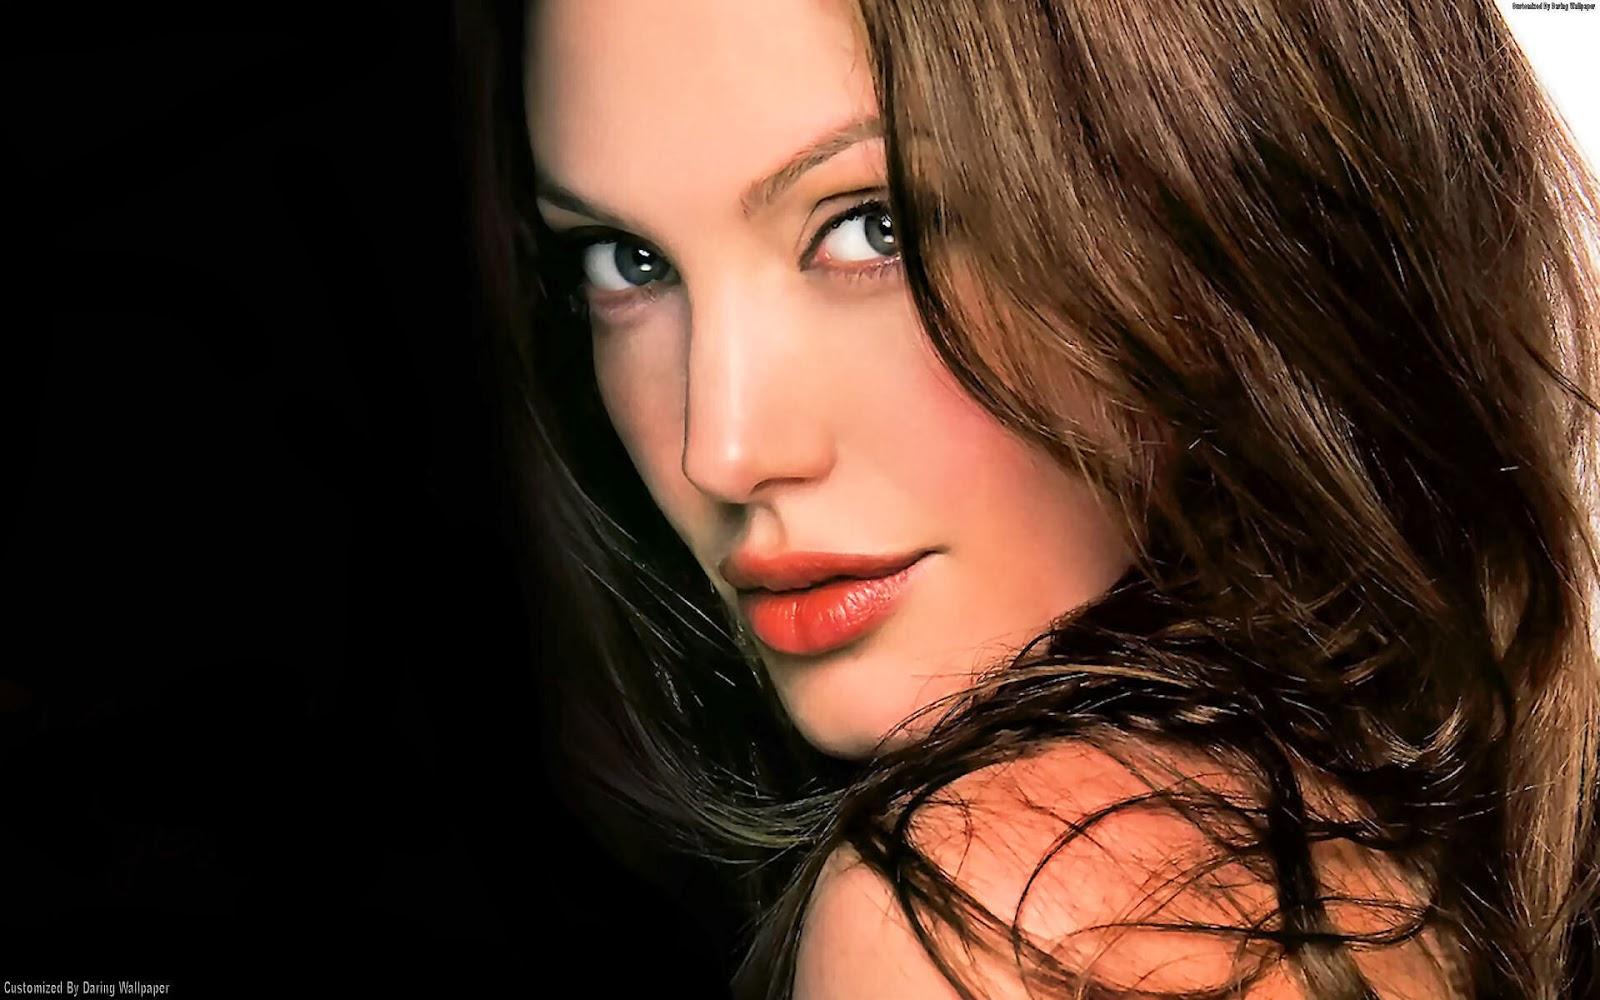 Angelina Jolie: Wallpaper Directory : Hollywood Megastar